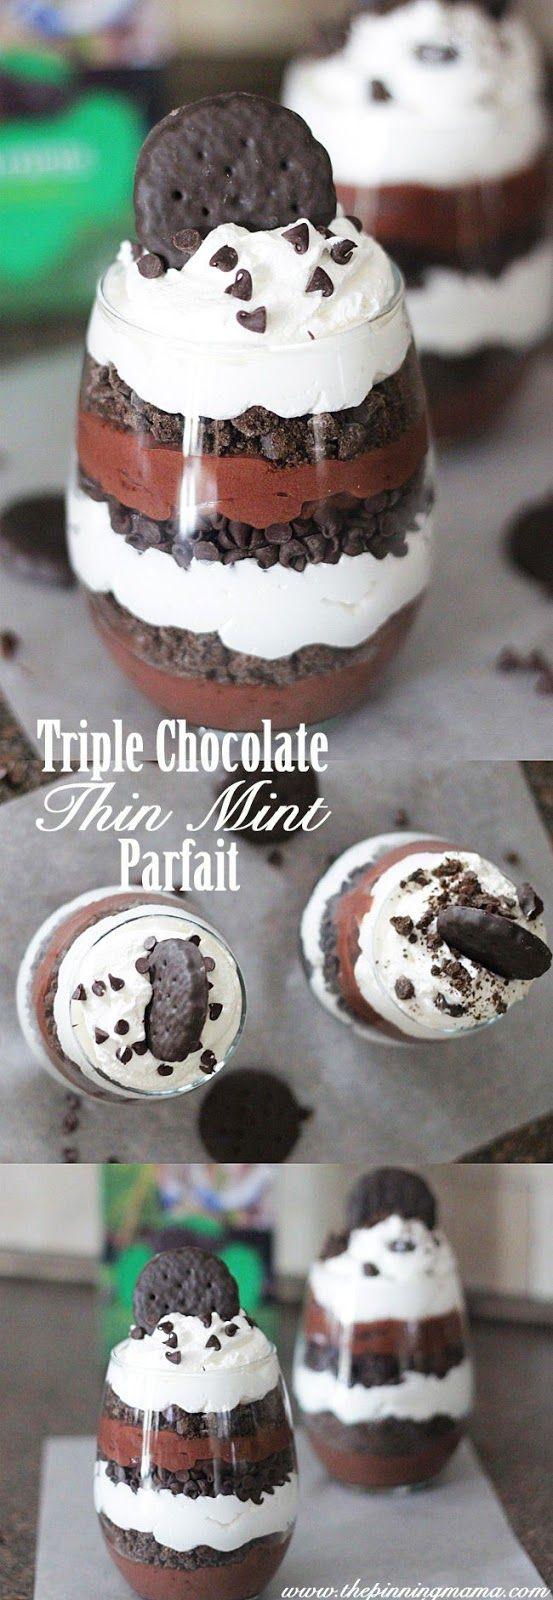 Triple Chocolate Thin Mint Parfait